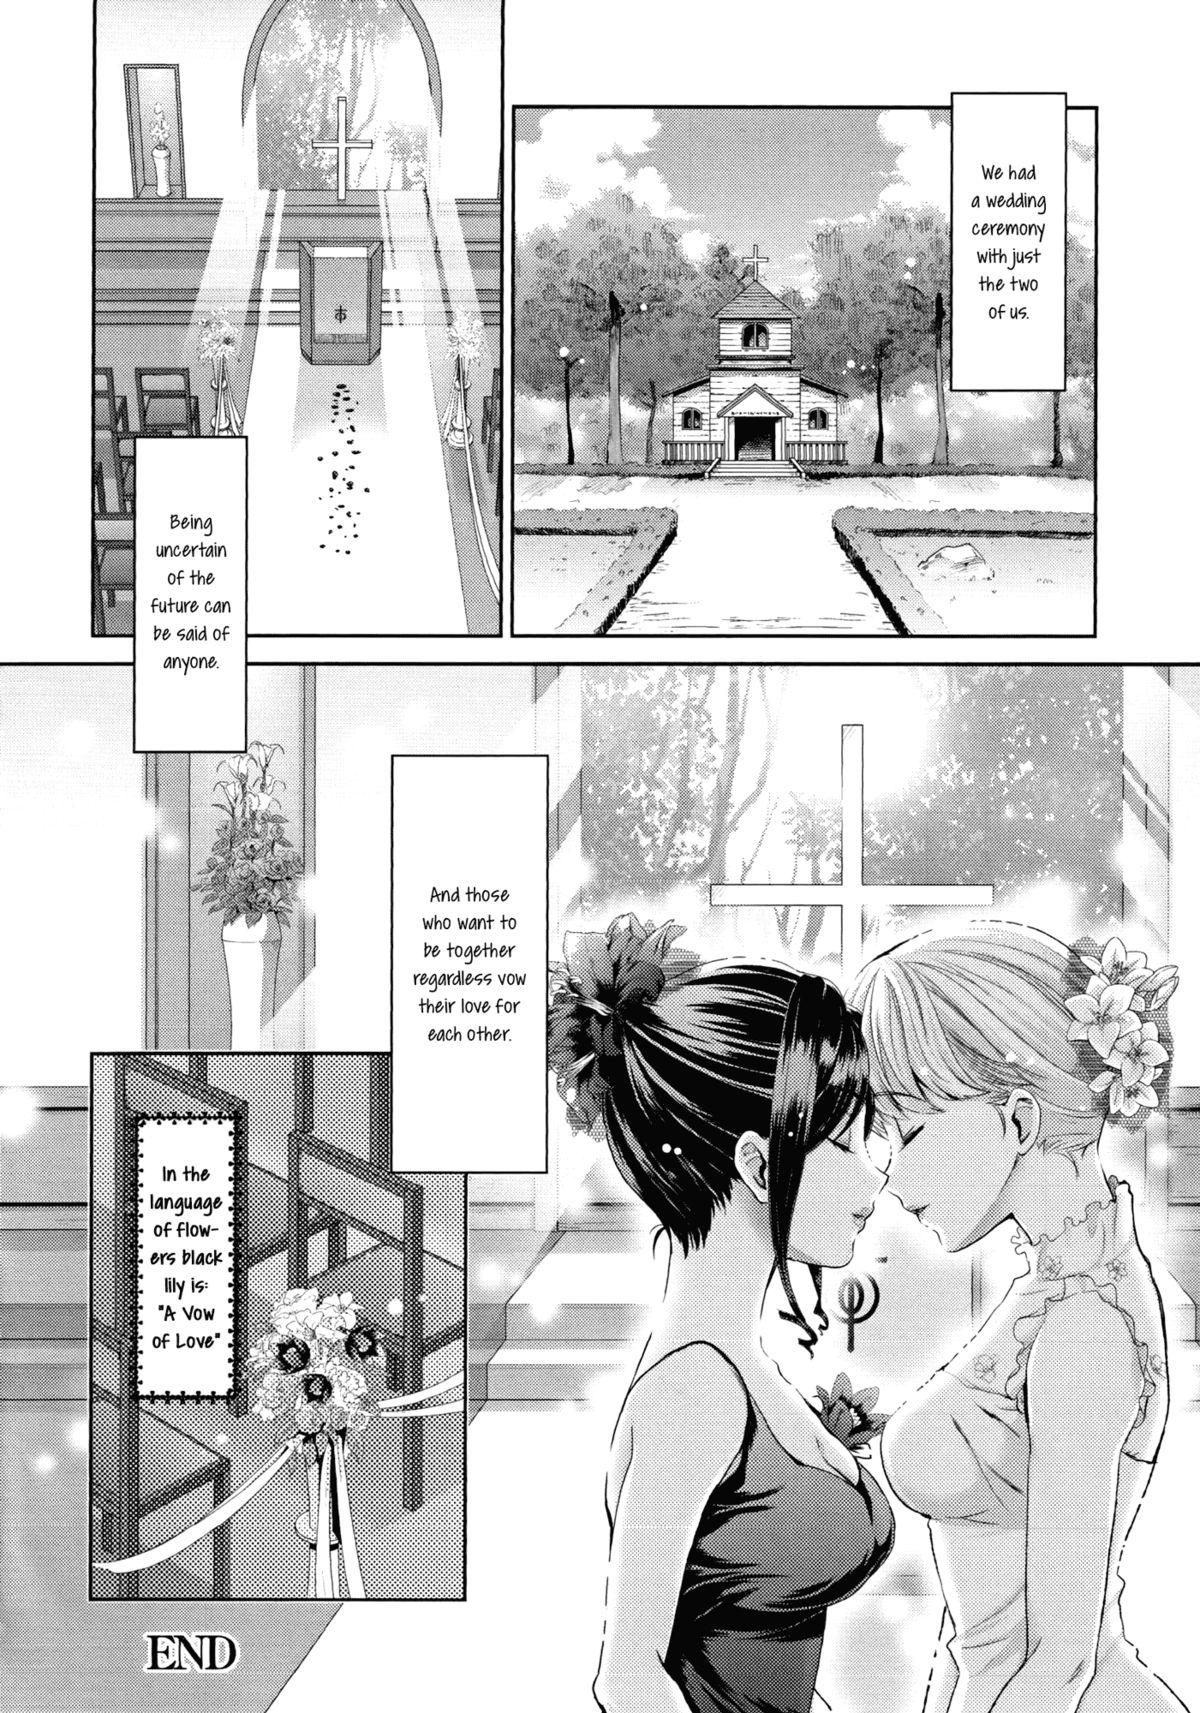 [Umemaru] Hanadan -Kuroyuri- | Conversation In The Language Of Flowers -Black Lily- (Aya Yuri Vol. 1) [English] [yuriproject] 17